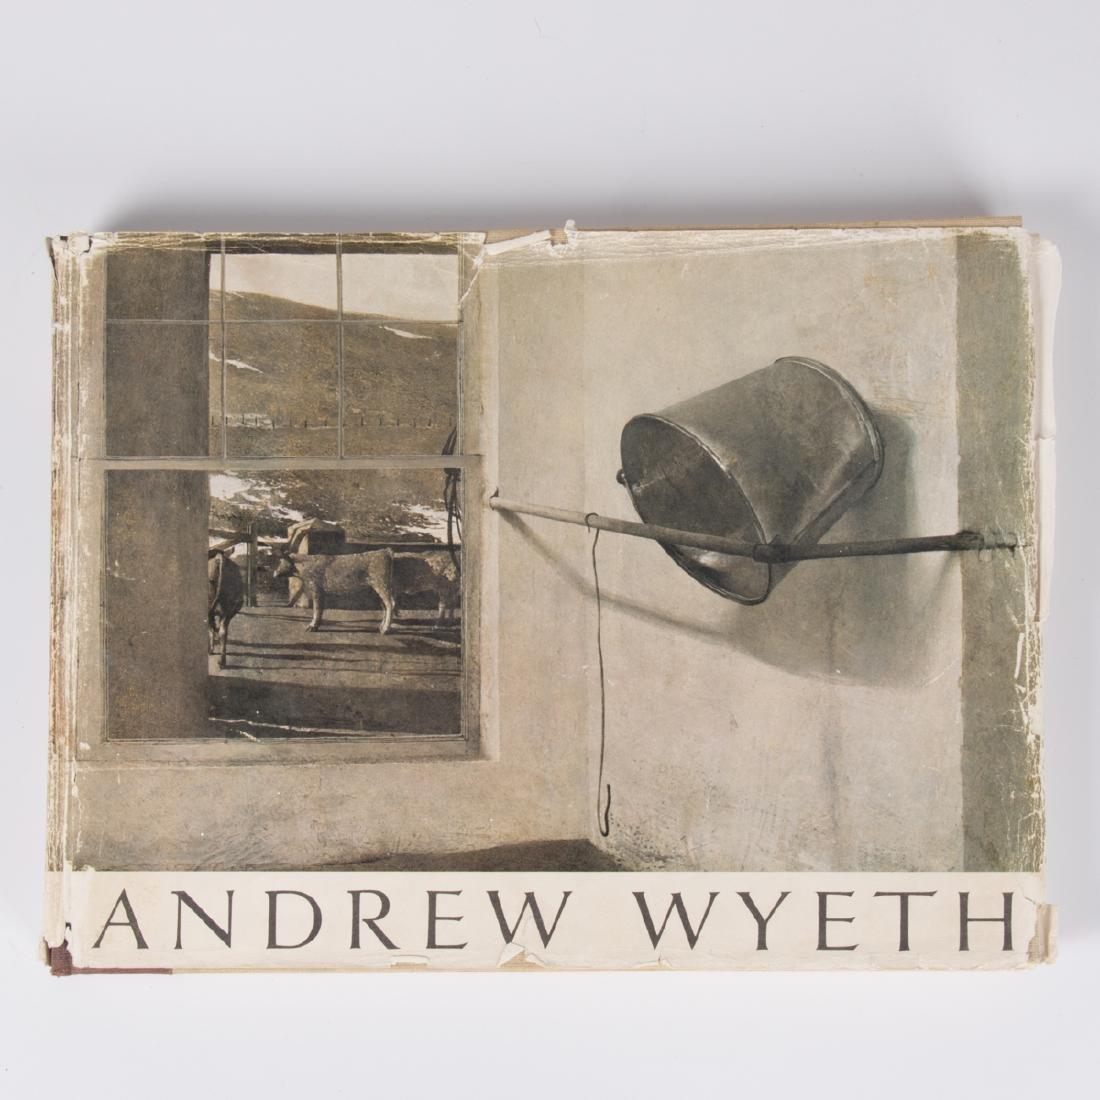 MERYMAN, Richard (1926-2015). Andrew Wyeth. Boston: